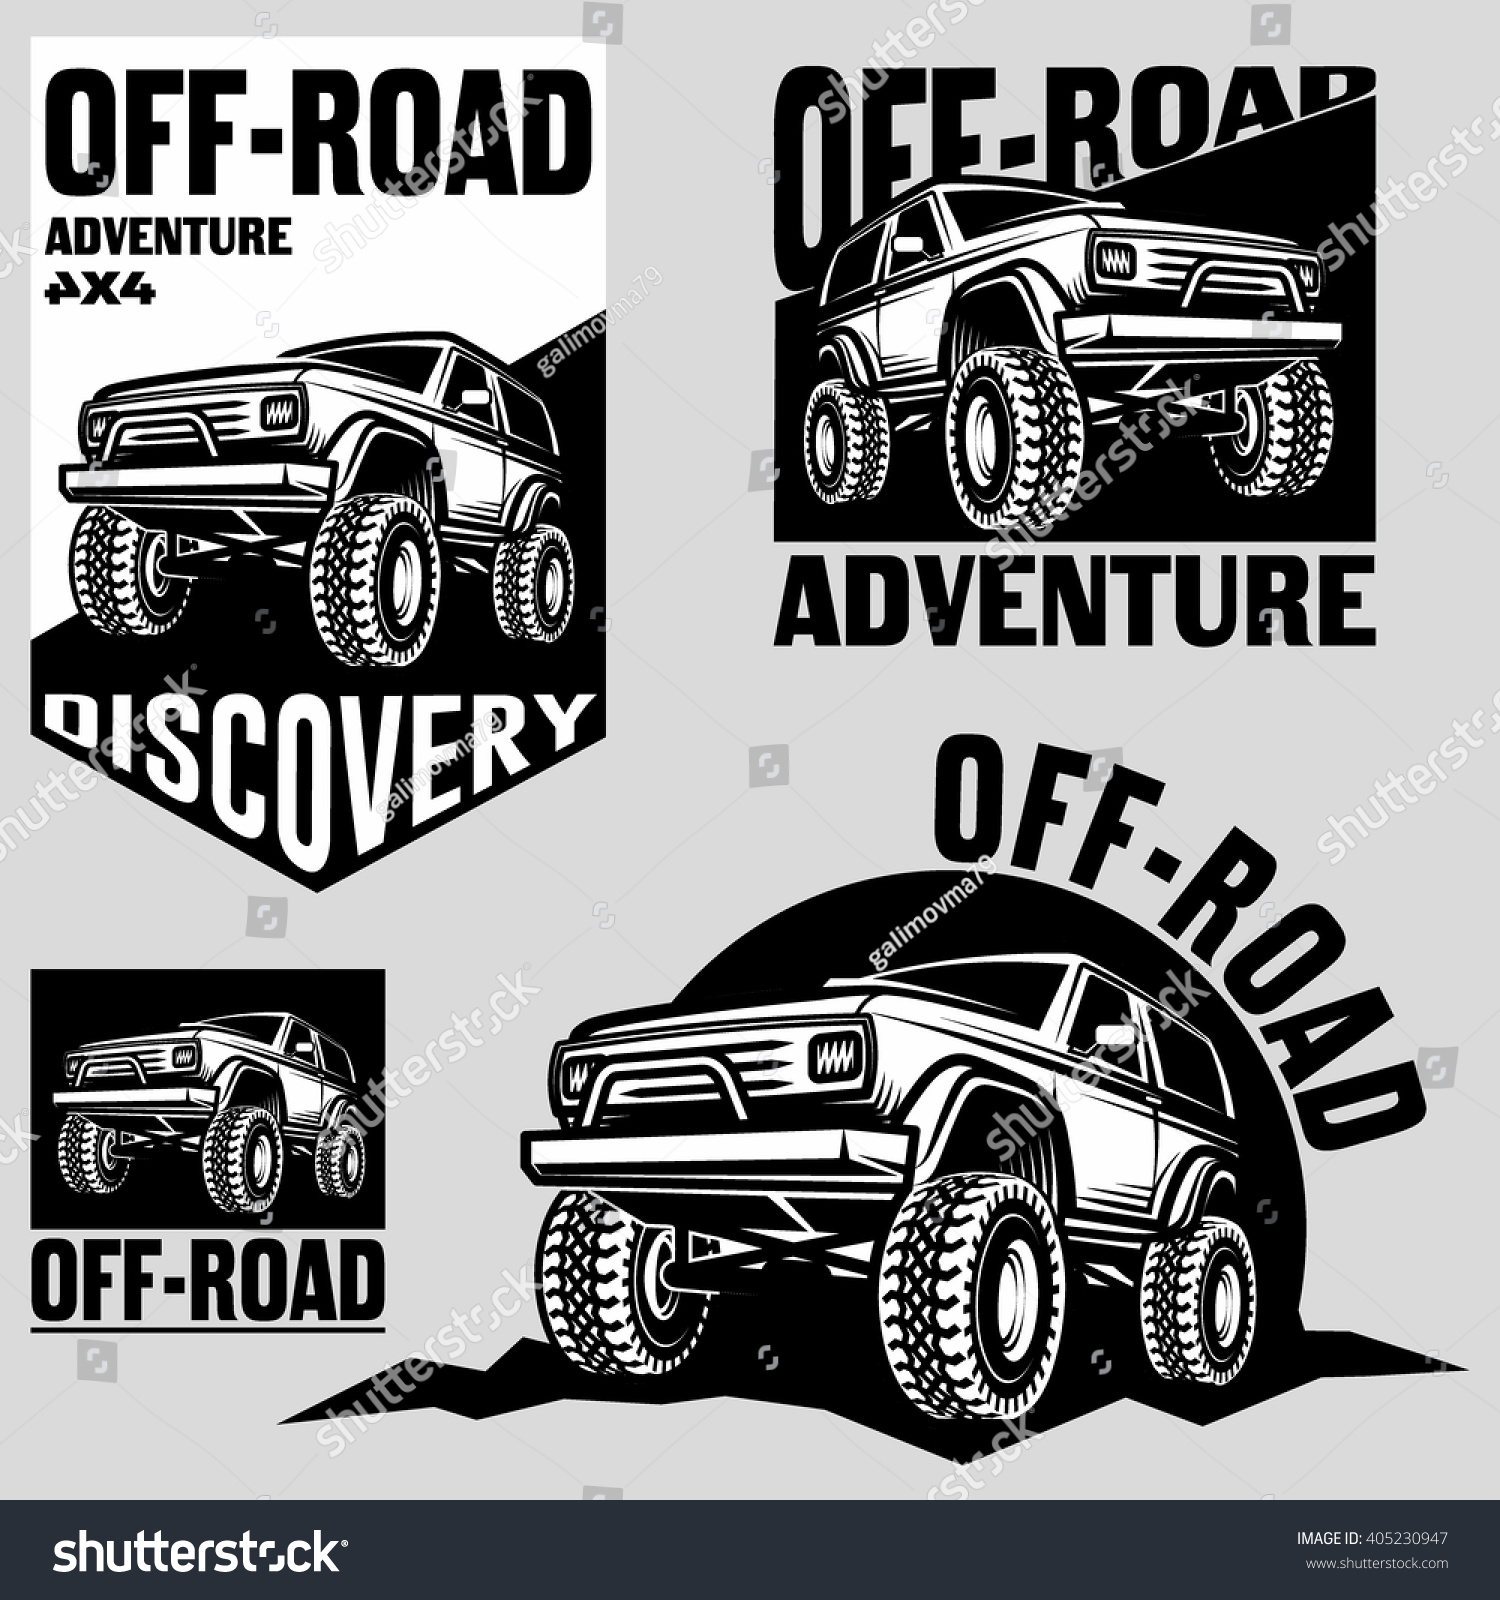 Design car club logo - Off Road Car Club Classic Design Elements Emblems Logo 4x4 Set Silhouette